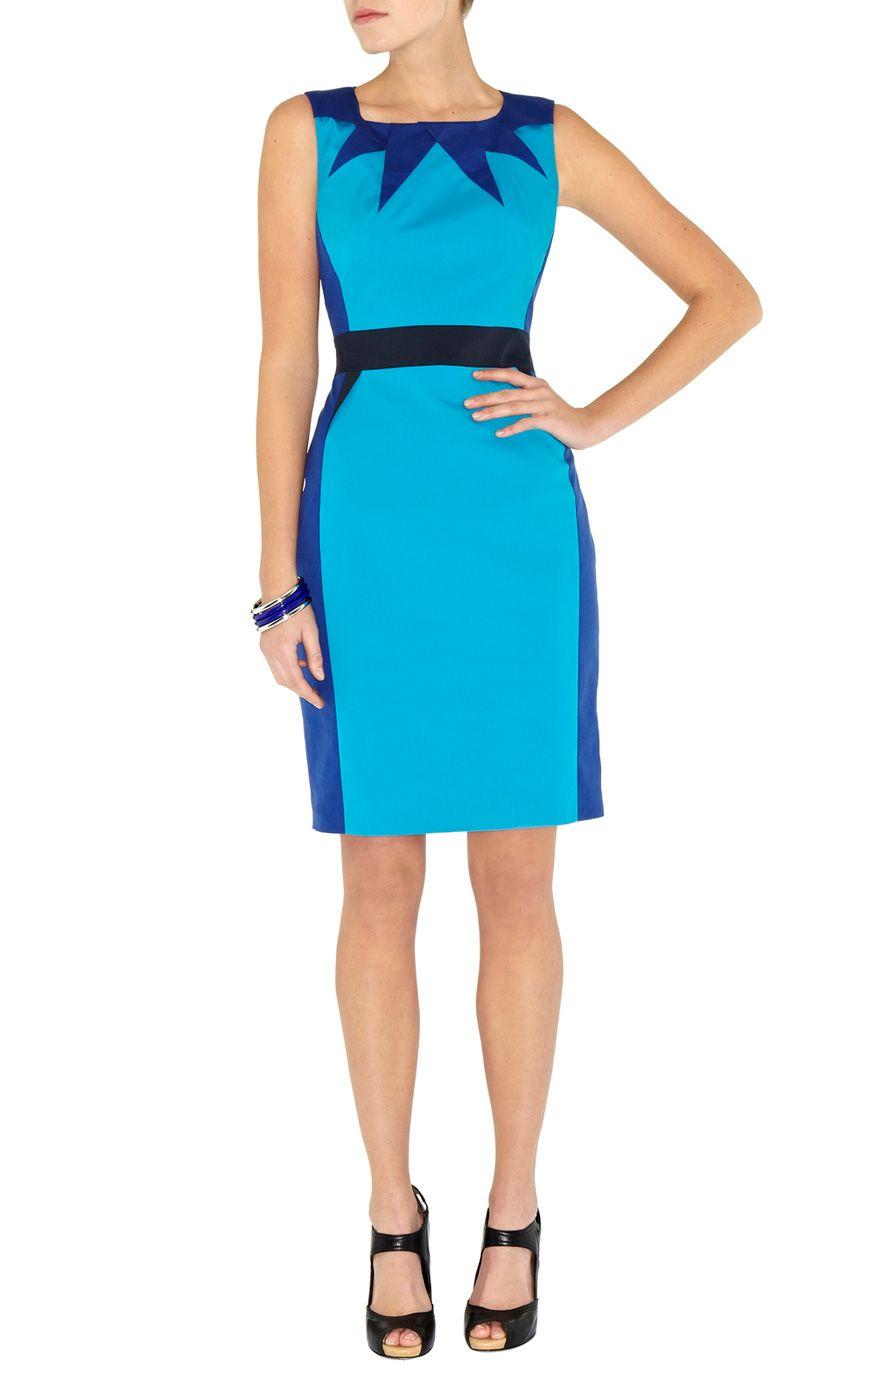 Fashion Karen Millen Dresses On SALE, CHEAP Karen Millen online shop ...